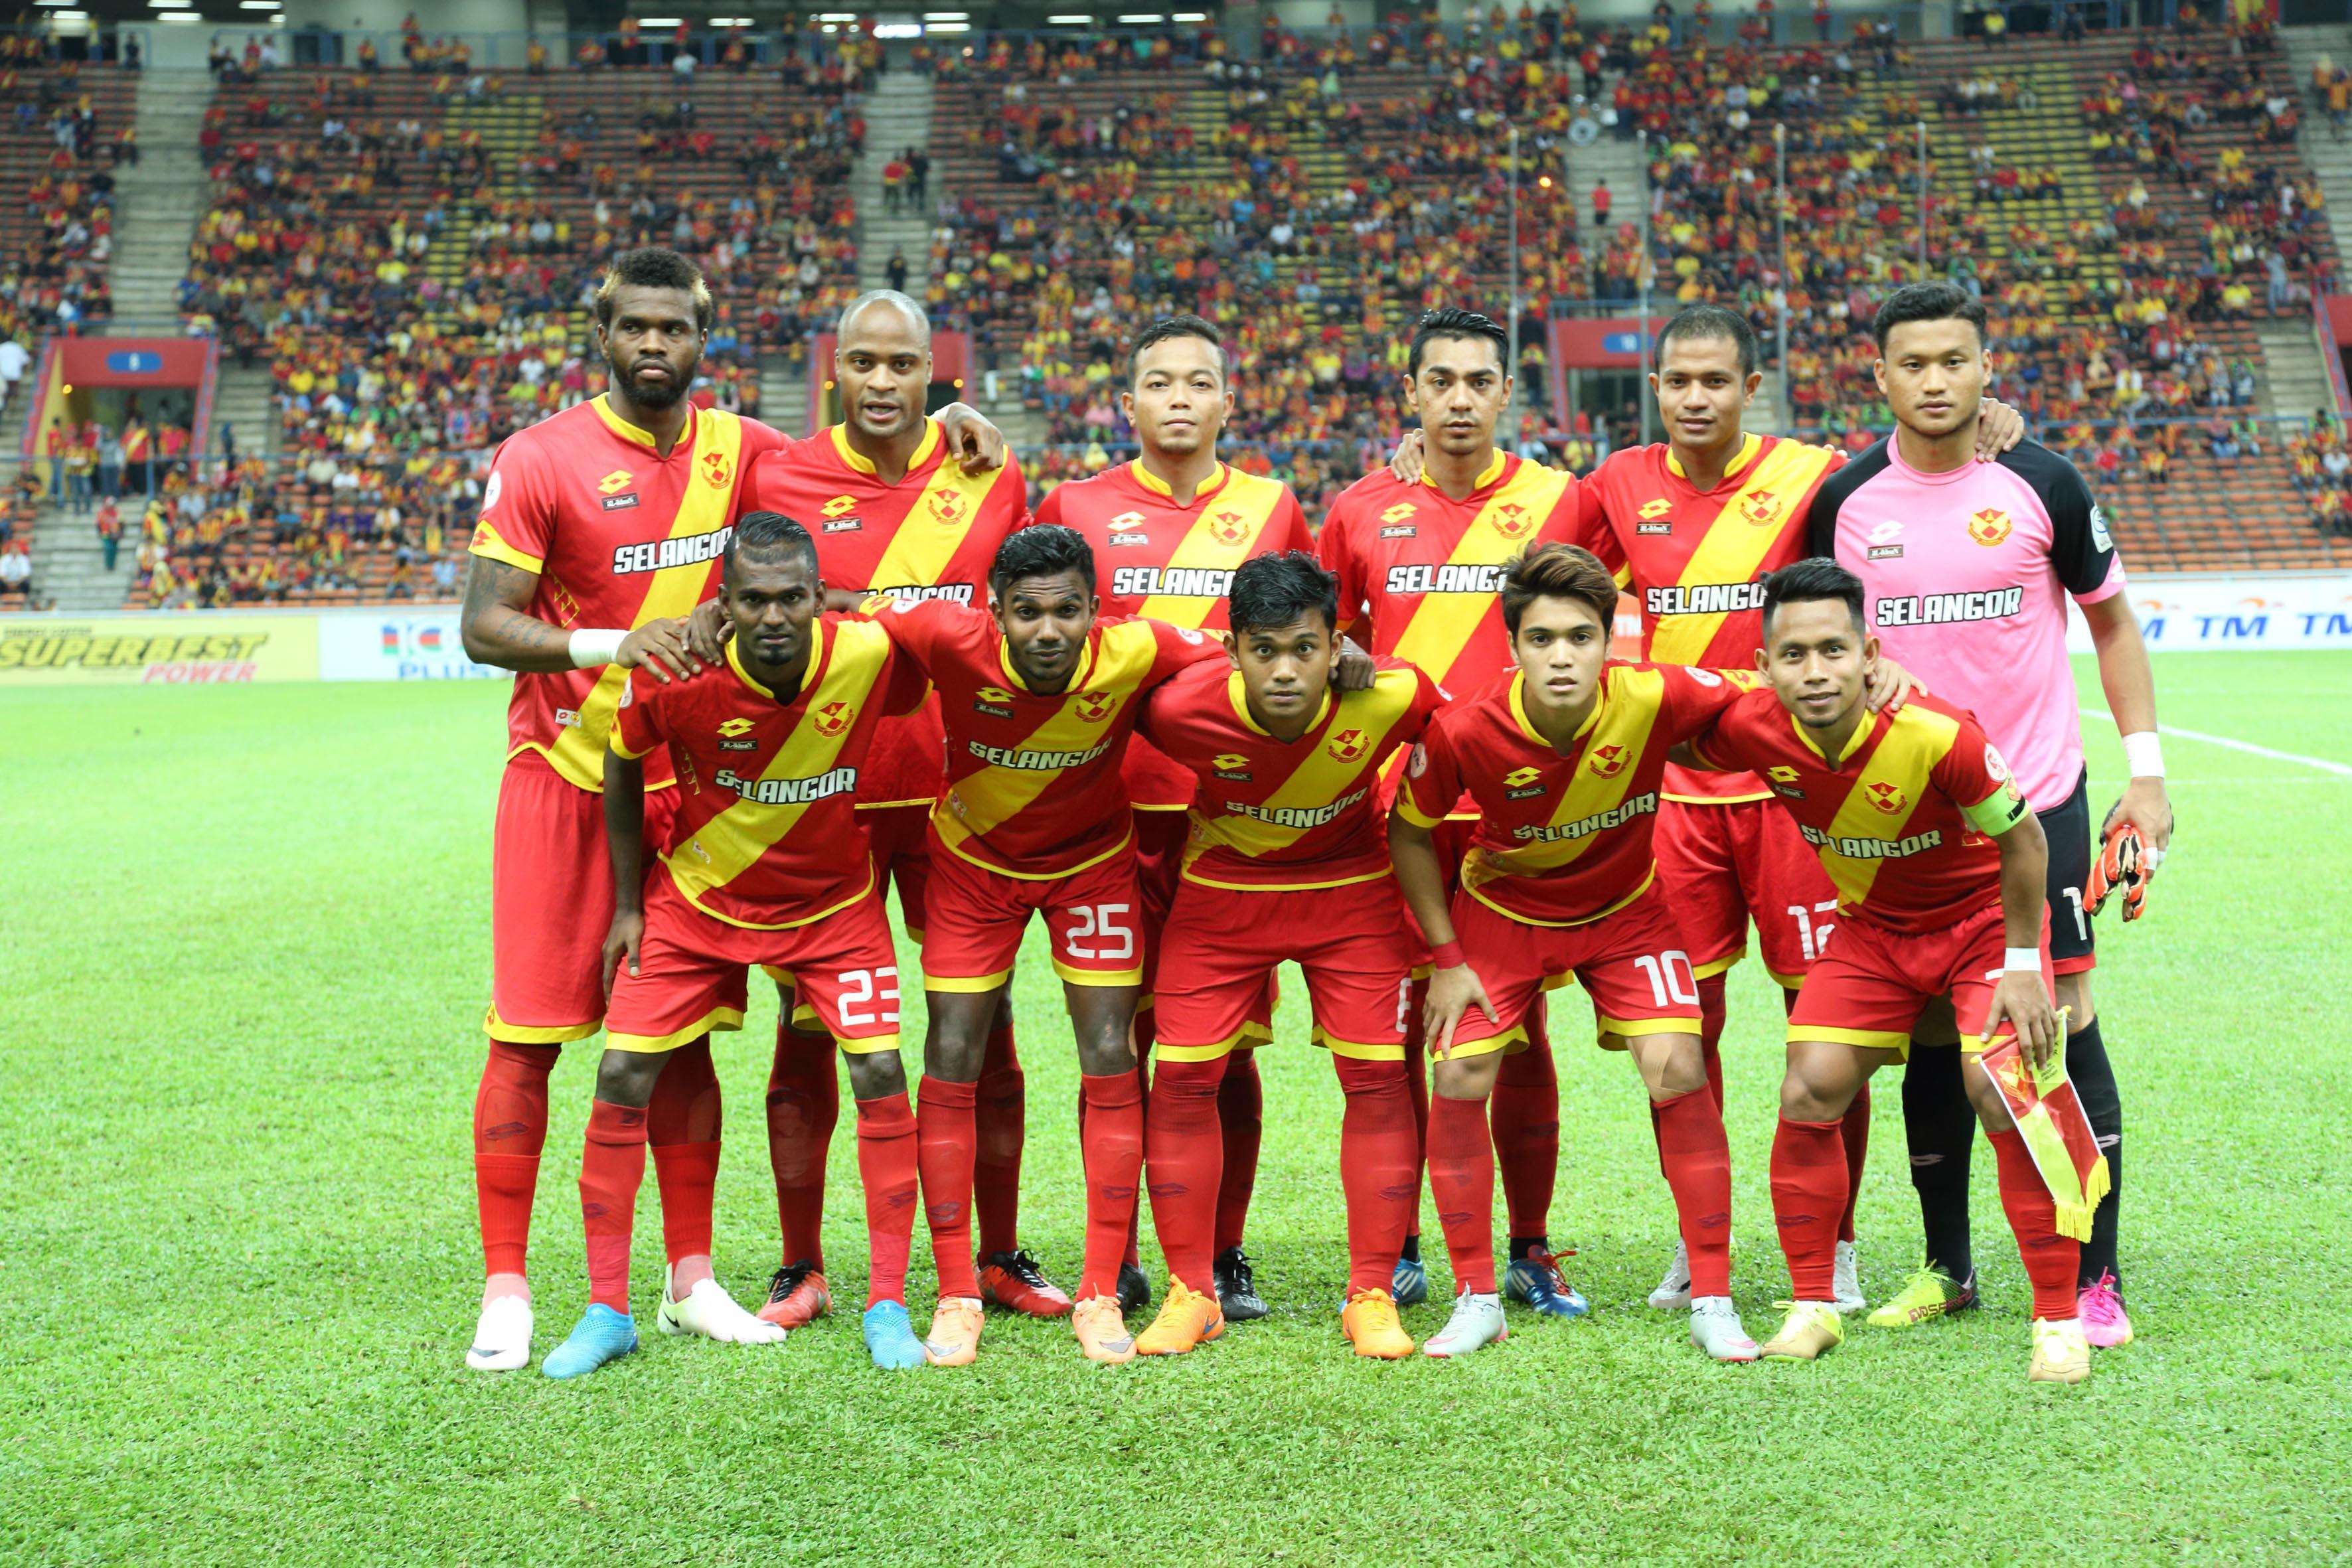 Selangor's line-up against PKNS 17/09/16